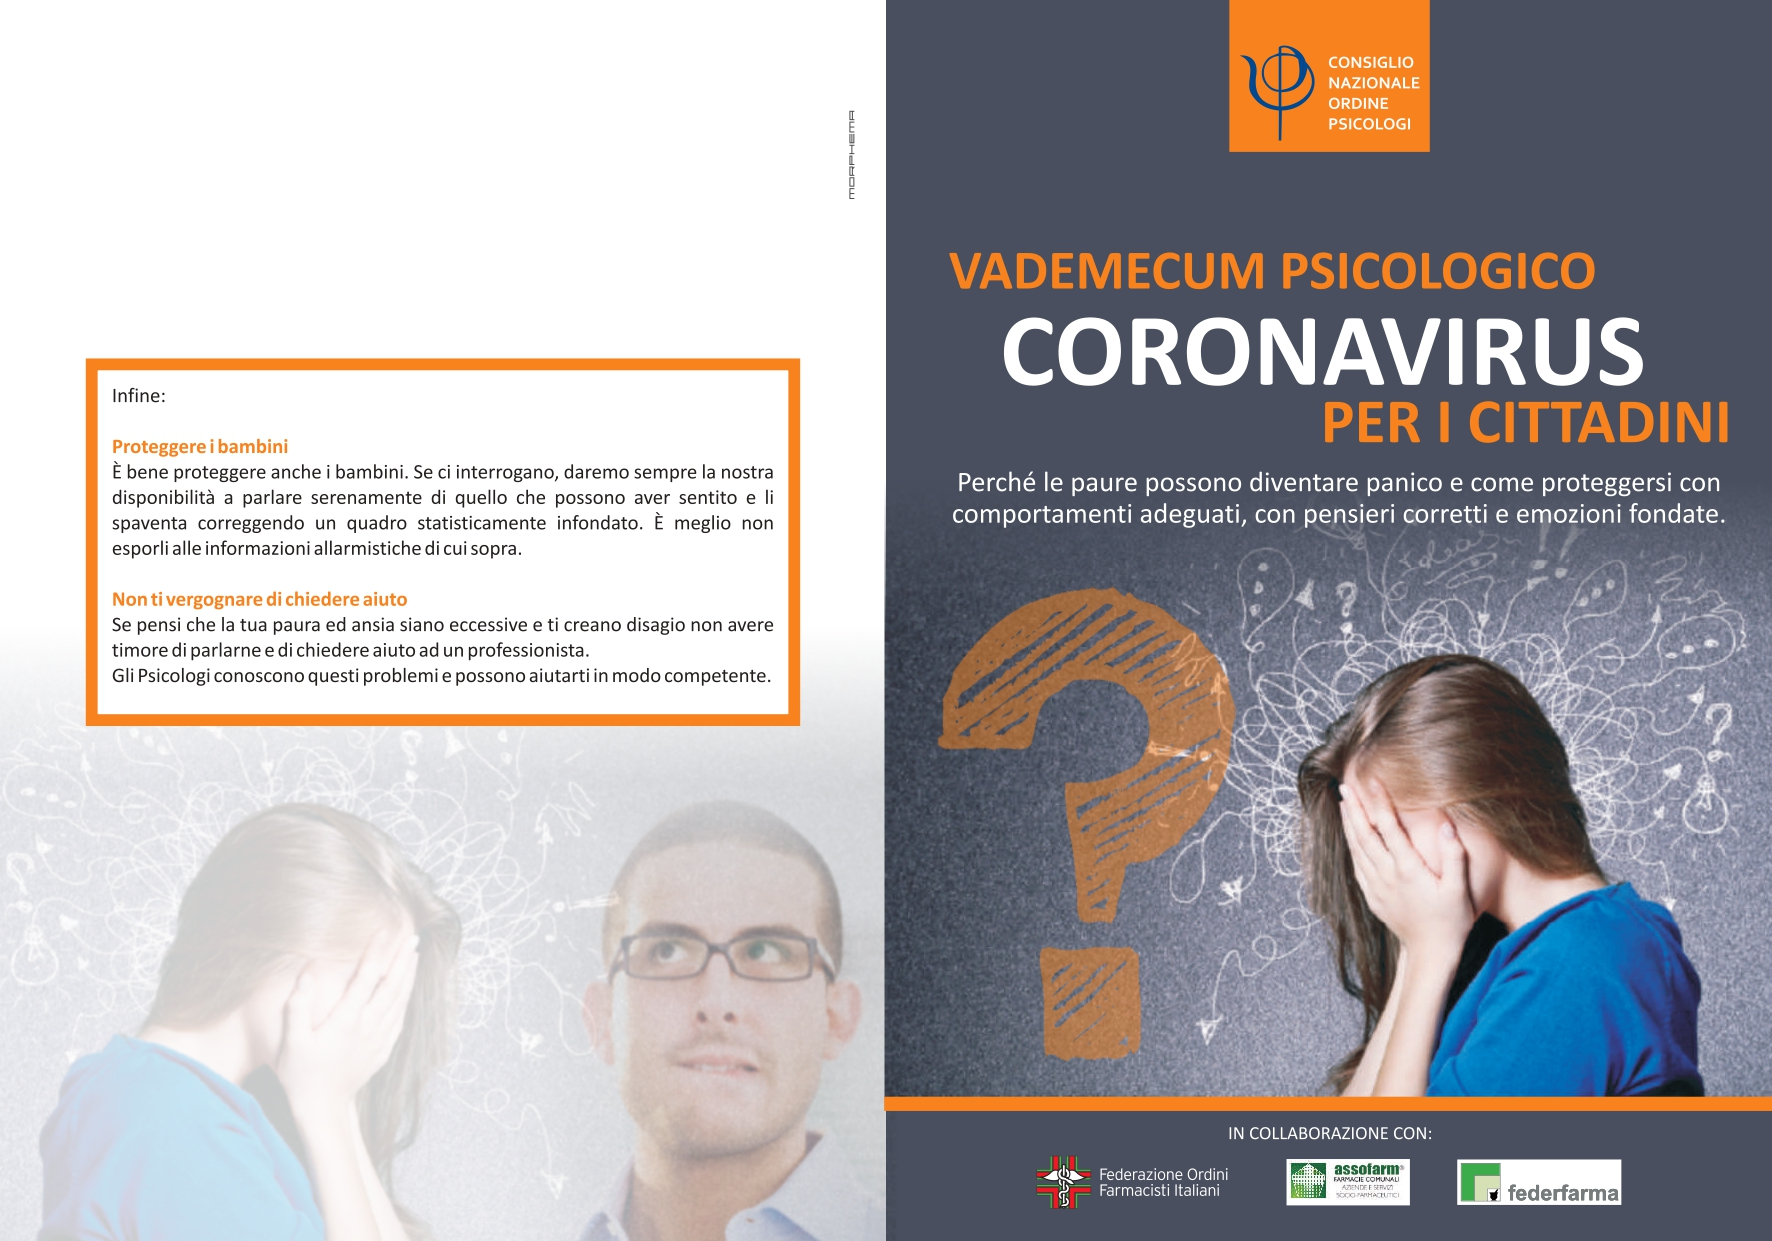 pieghevole vademecum coronavirus con loghi_page-0001 (1)